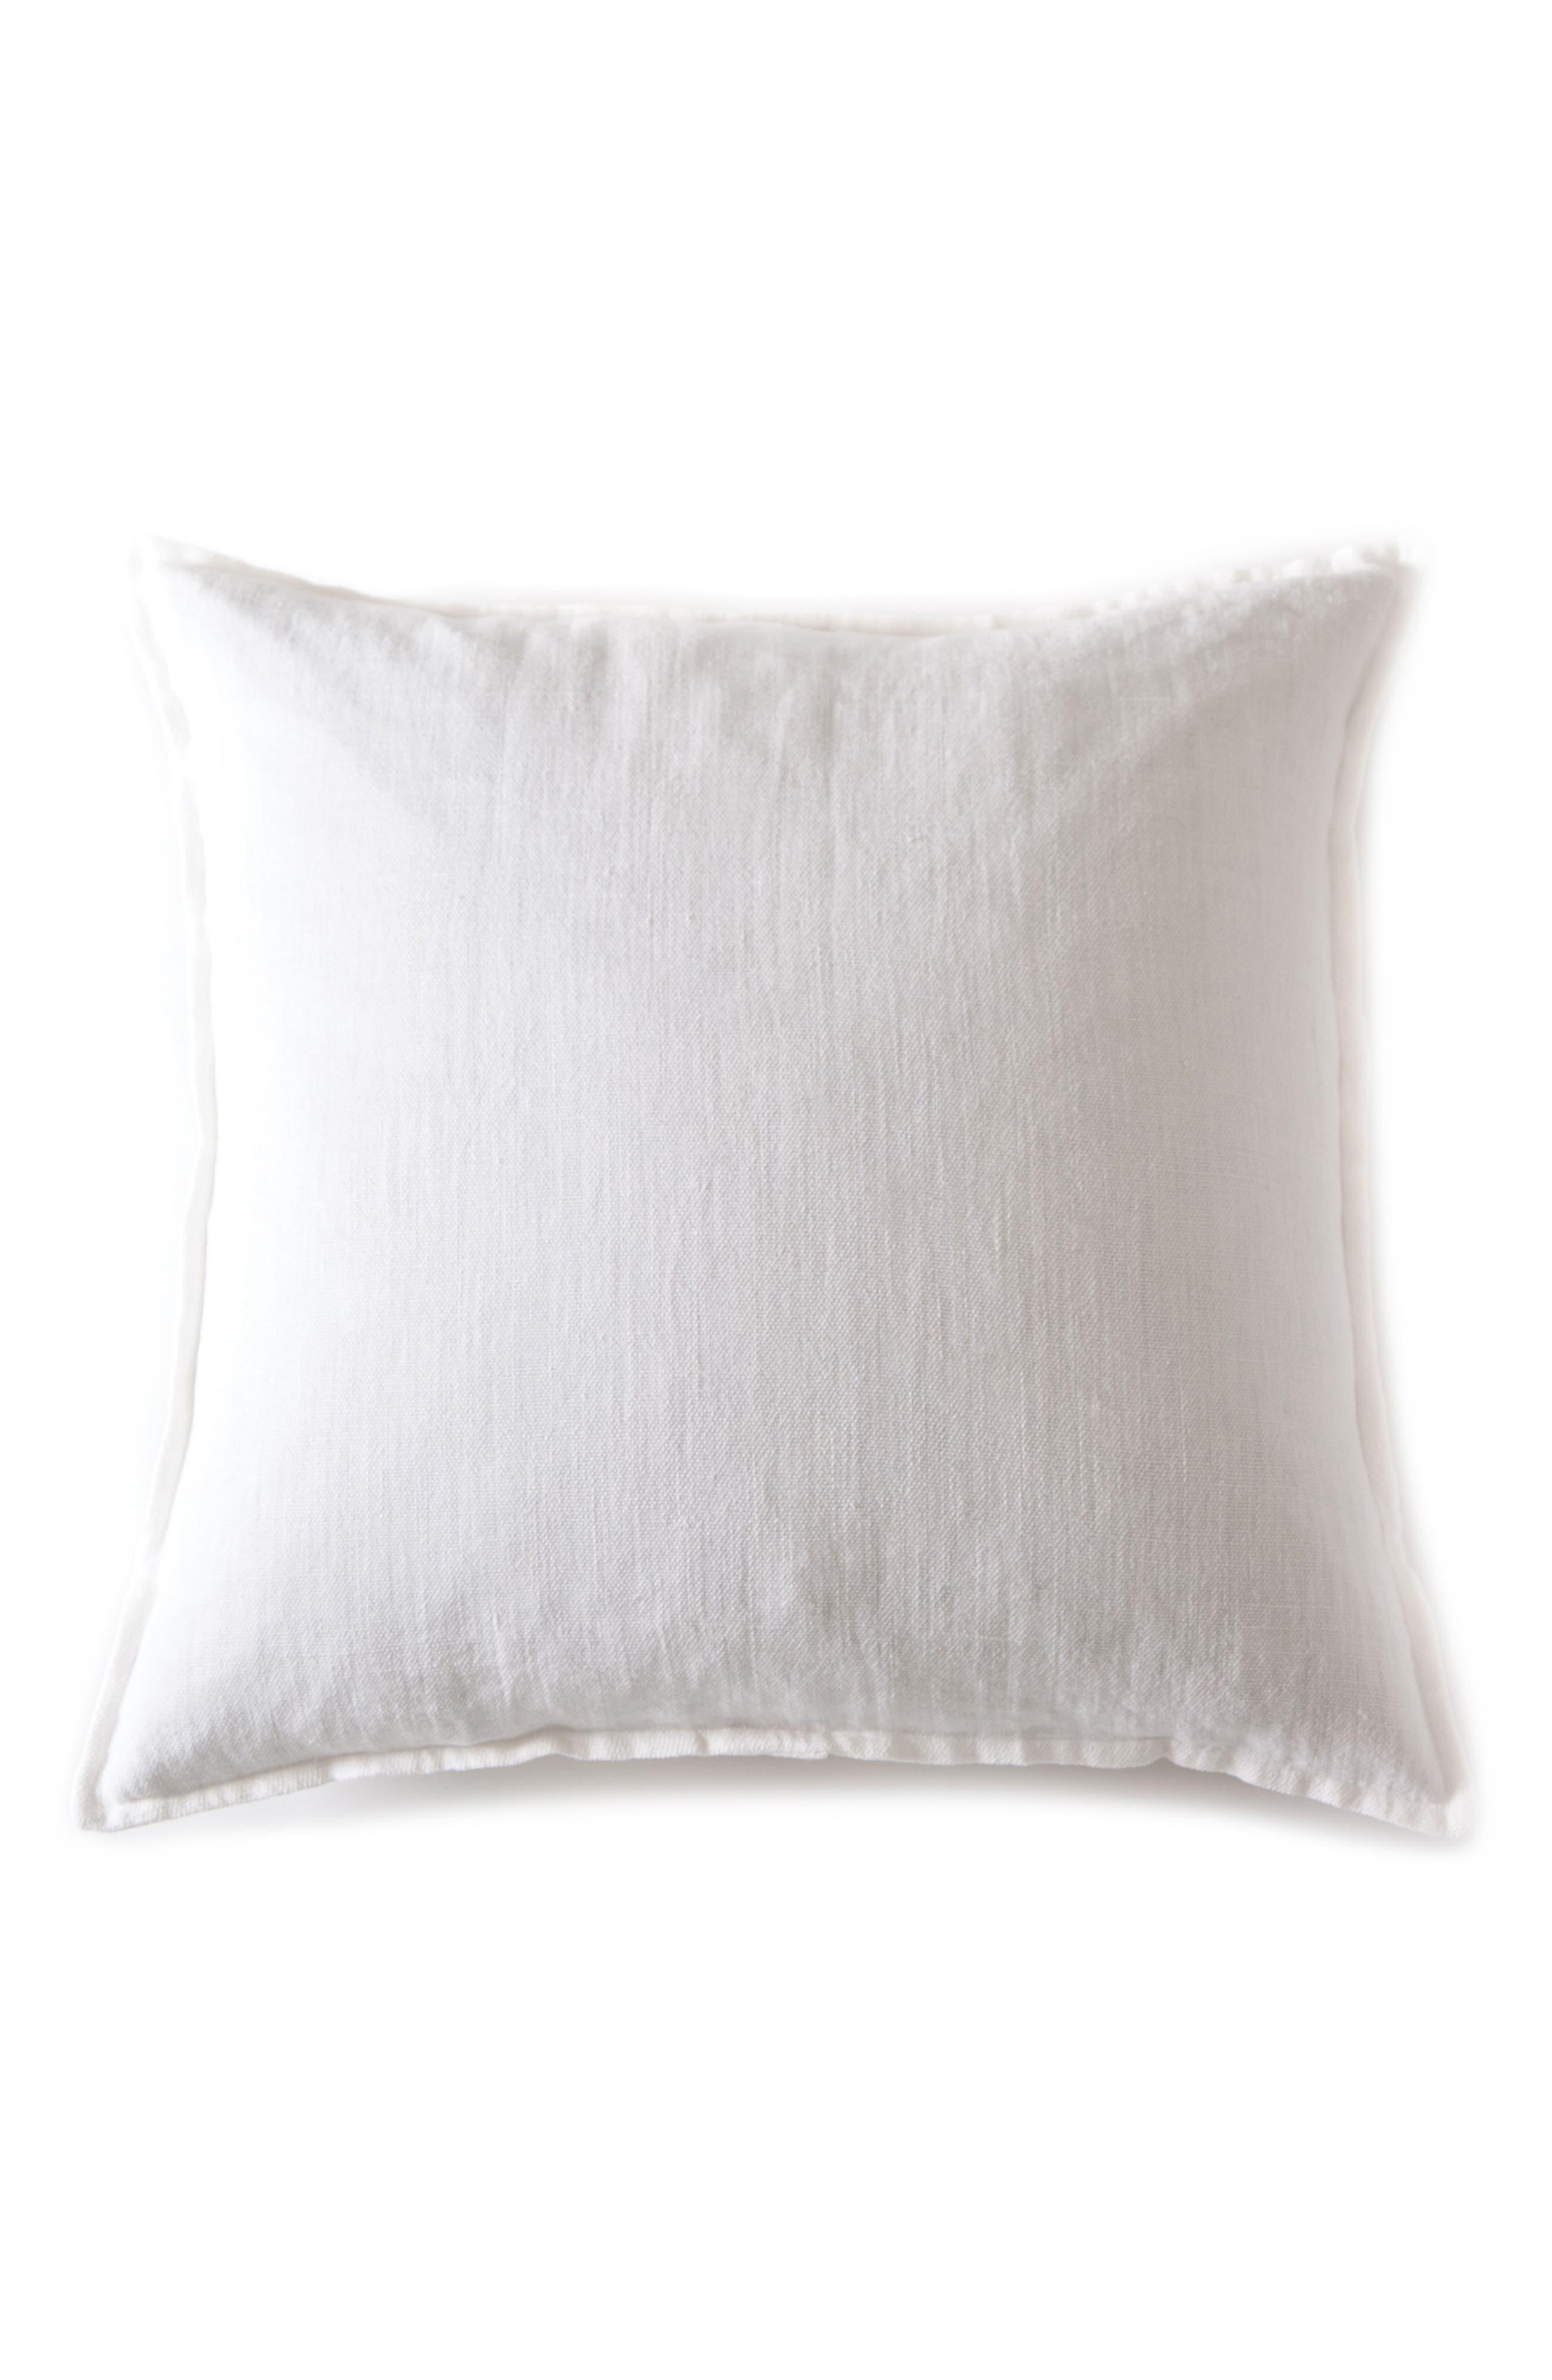 Montauk Big Throw Blanket,                             Alternate thumbnail 2, color,                             WHITE